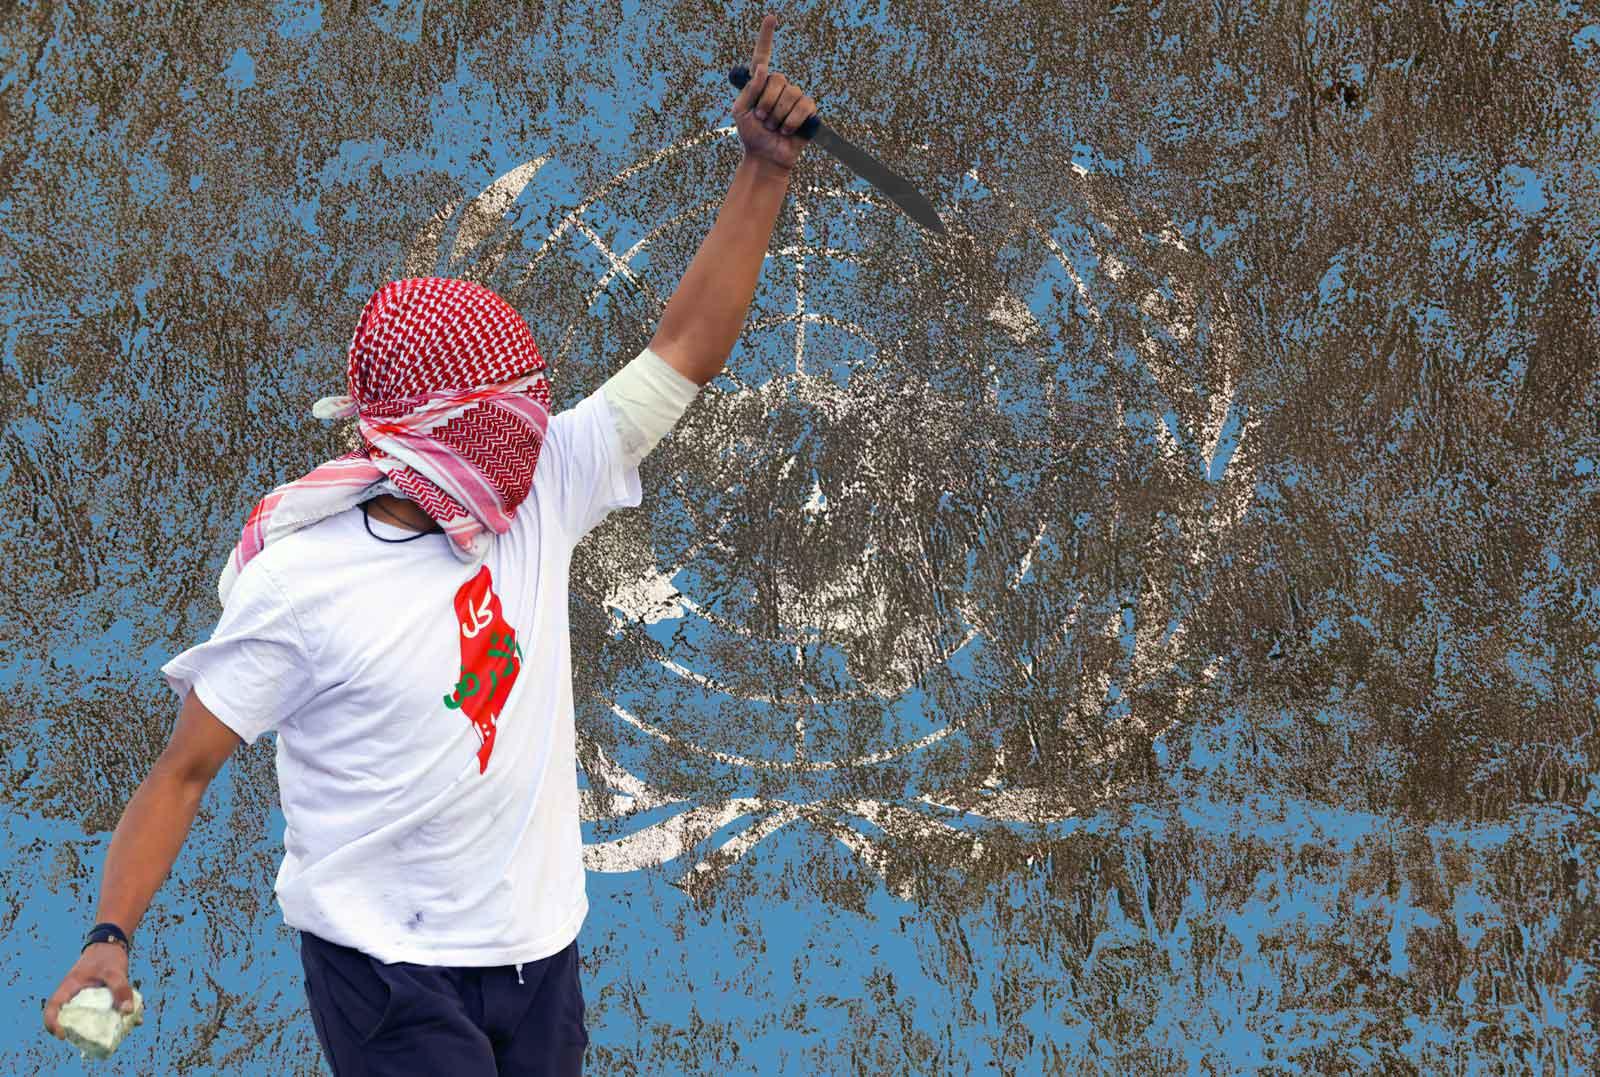 La ONU canaliza millones a ONG palestinas vinculadas al terrorismo